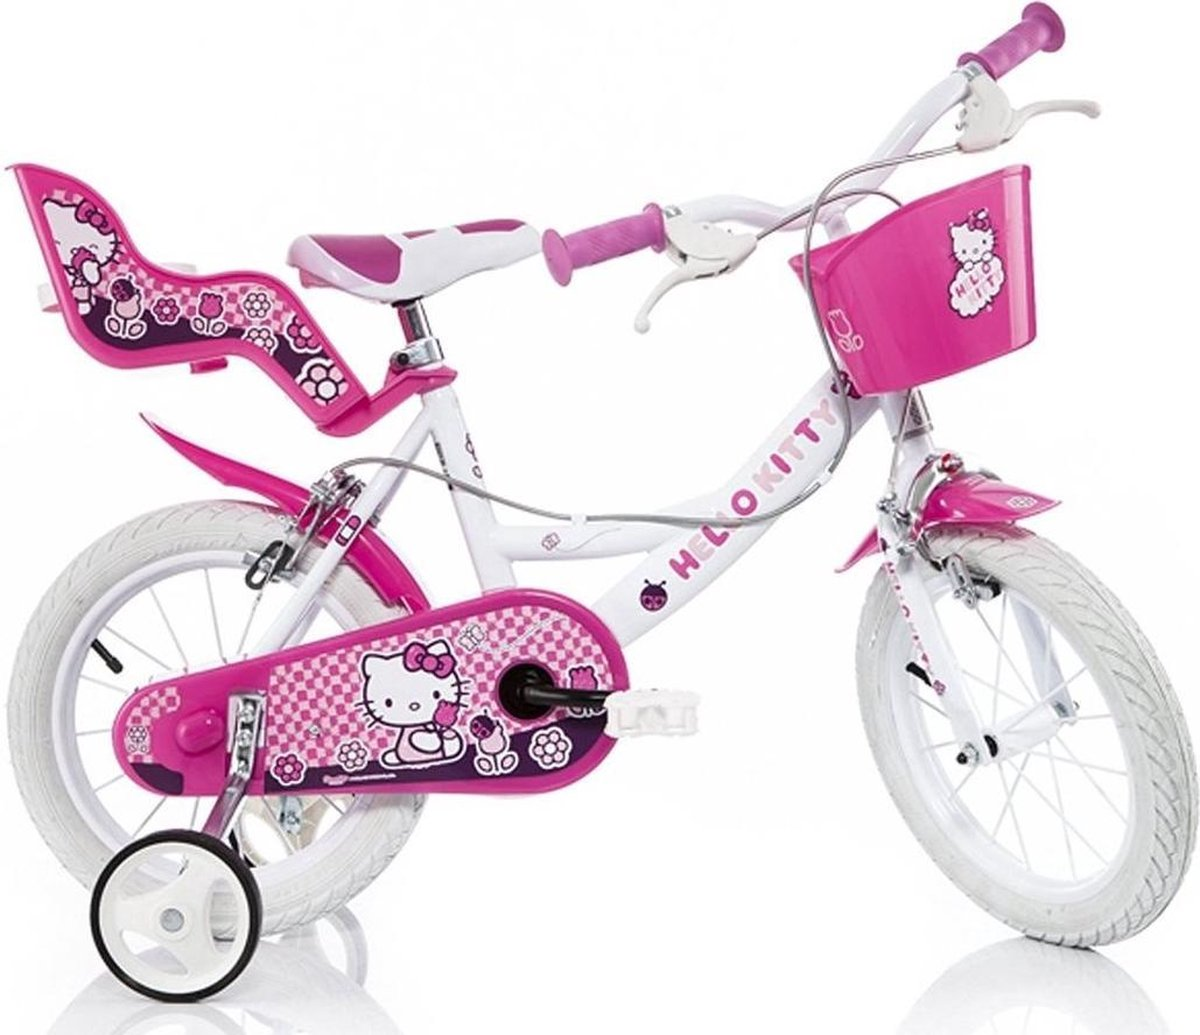 Dino Bikes Dino 164r-hk Hello Kitty Kinderfiets Vrouwen Roze 16 online kopen